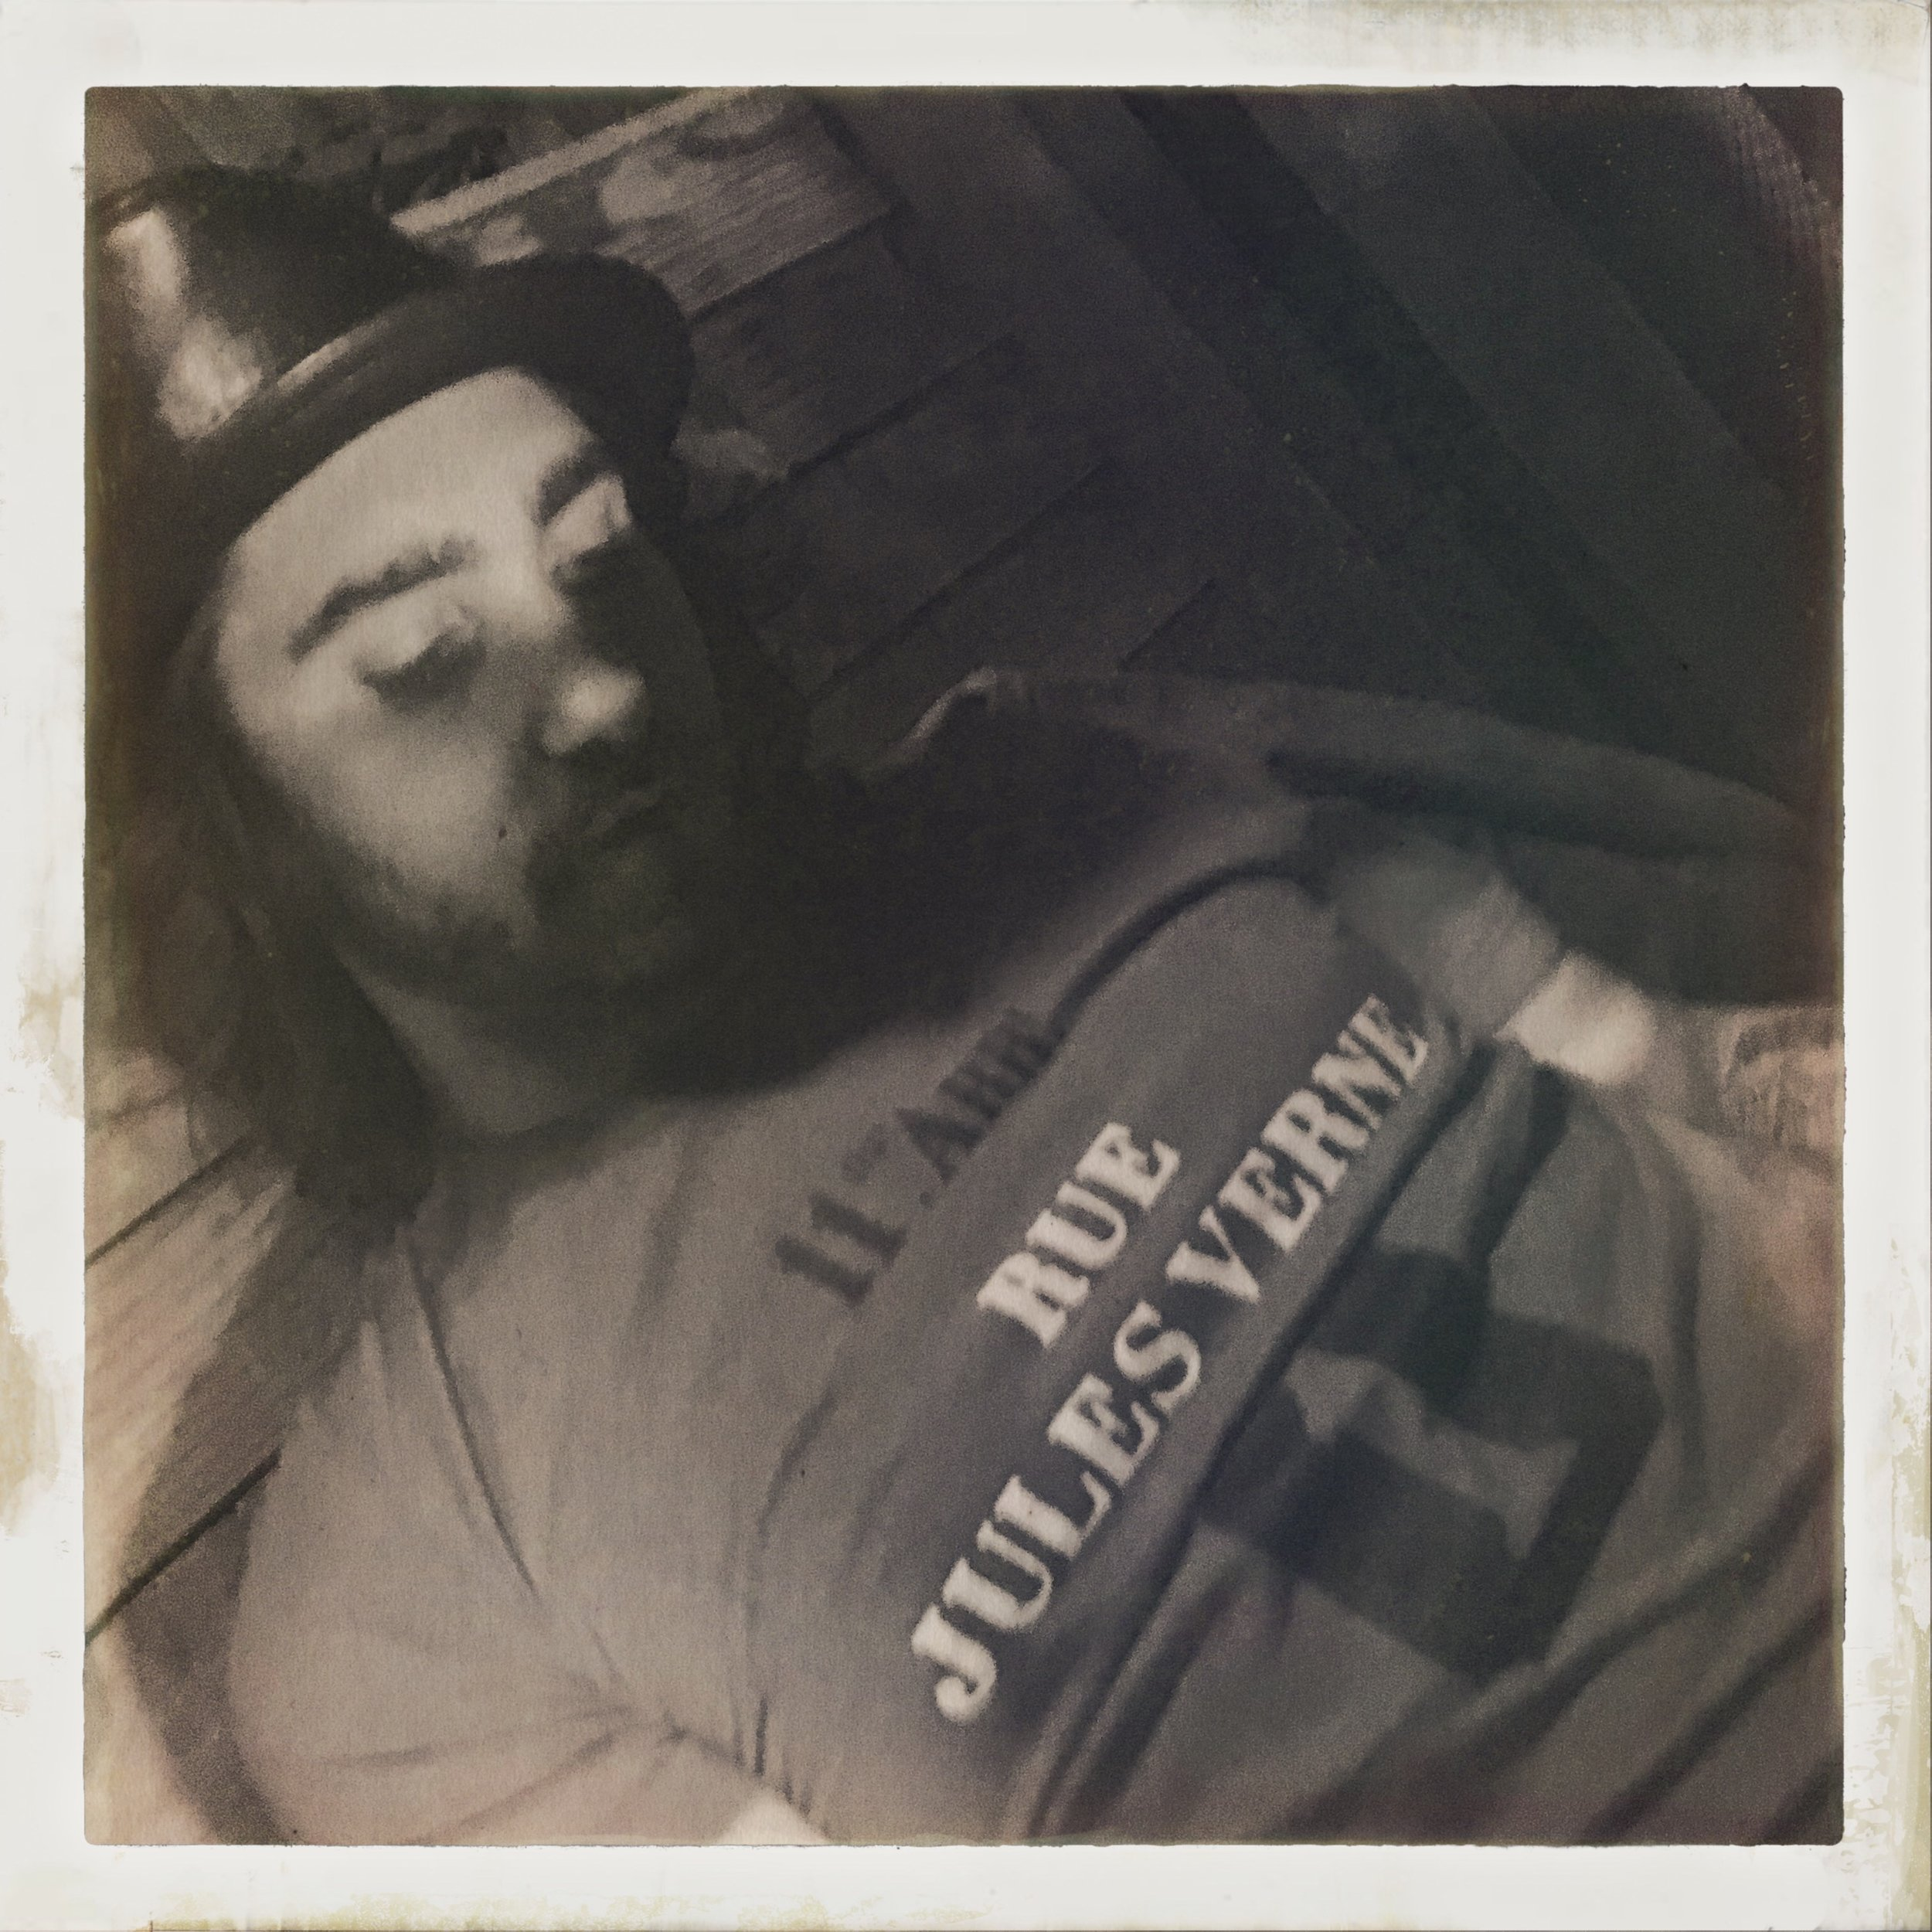 Louis_shirts_026.jpg